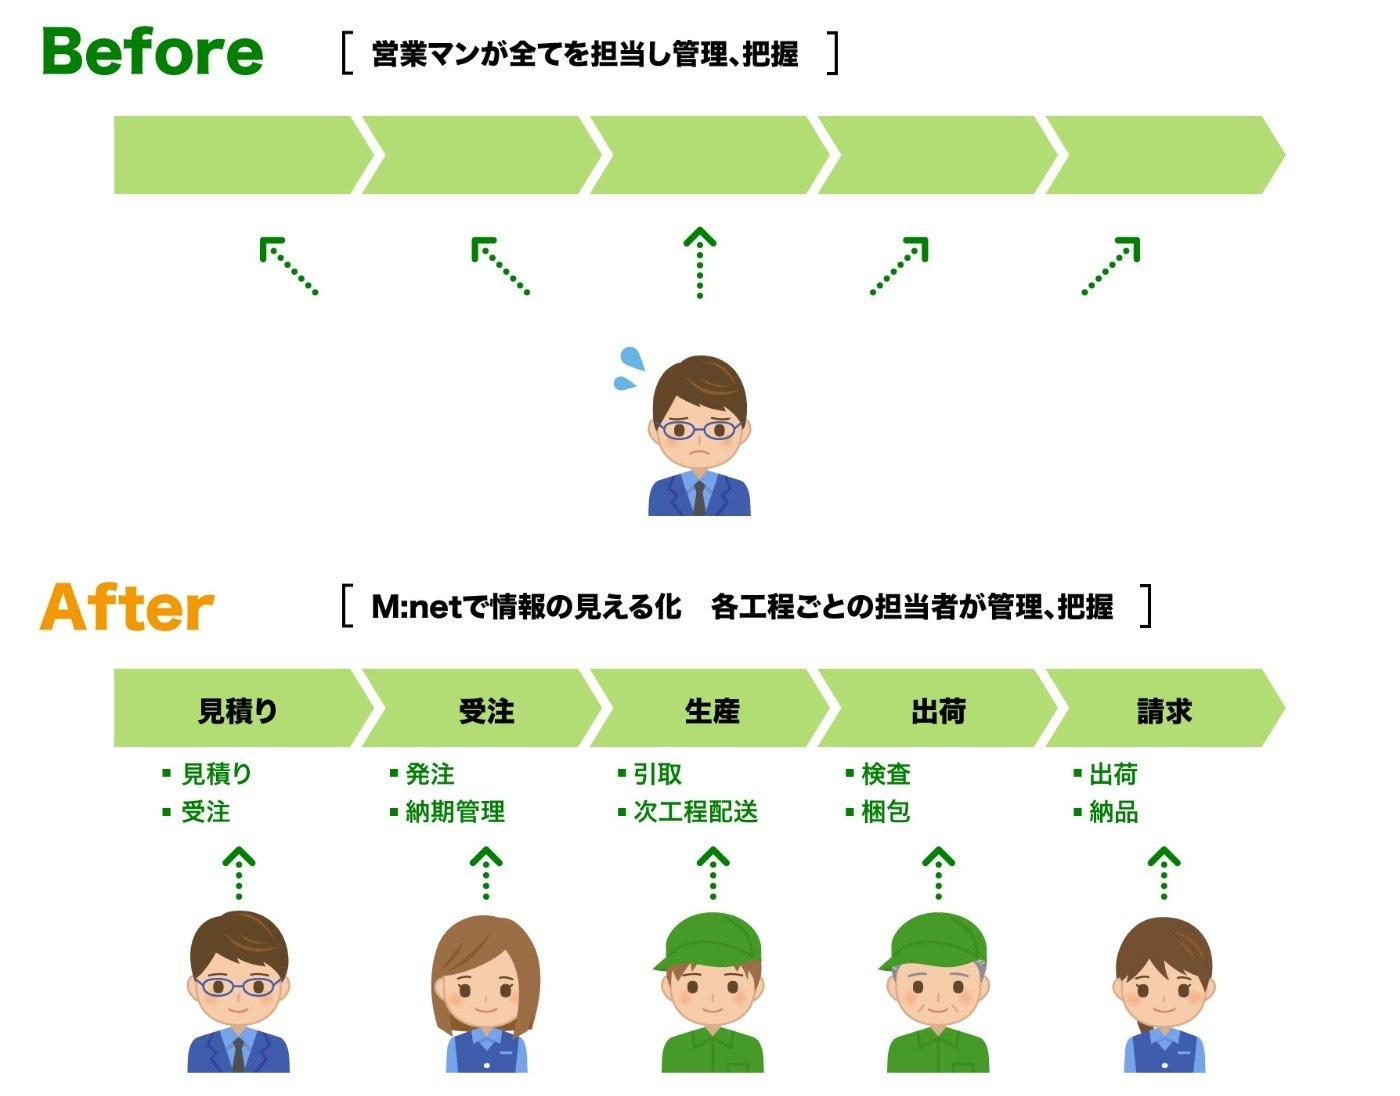 Before:営業マンが全てを担当し管理、把握 / After:Mnetで情報の見える化 各工程ごとの担当者が管理、把握